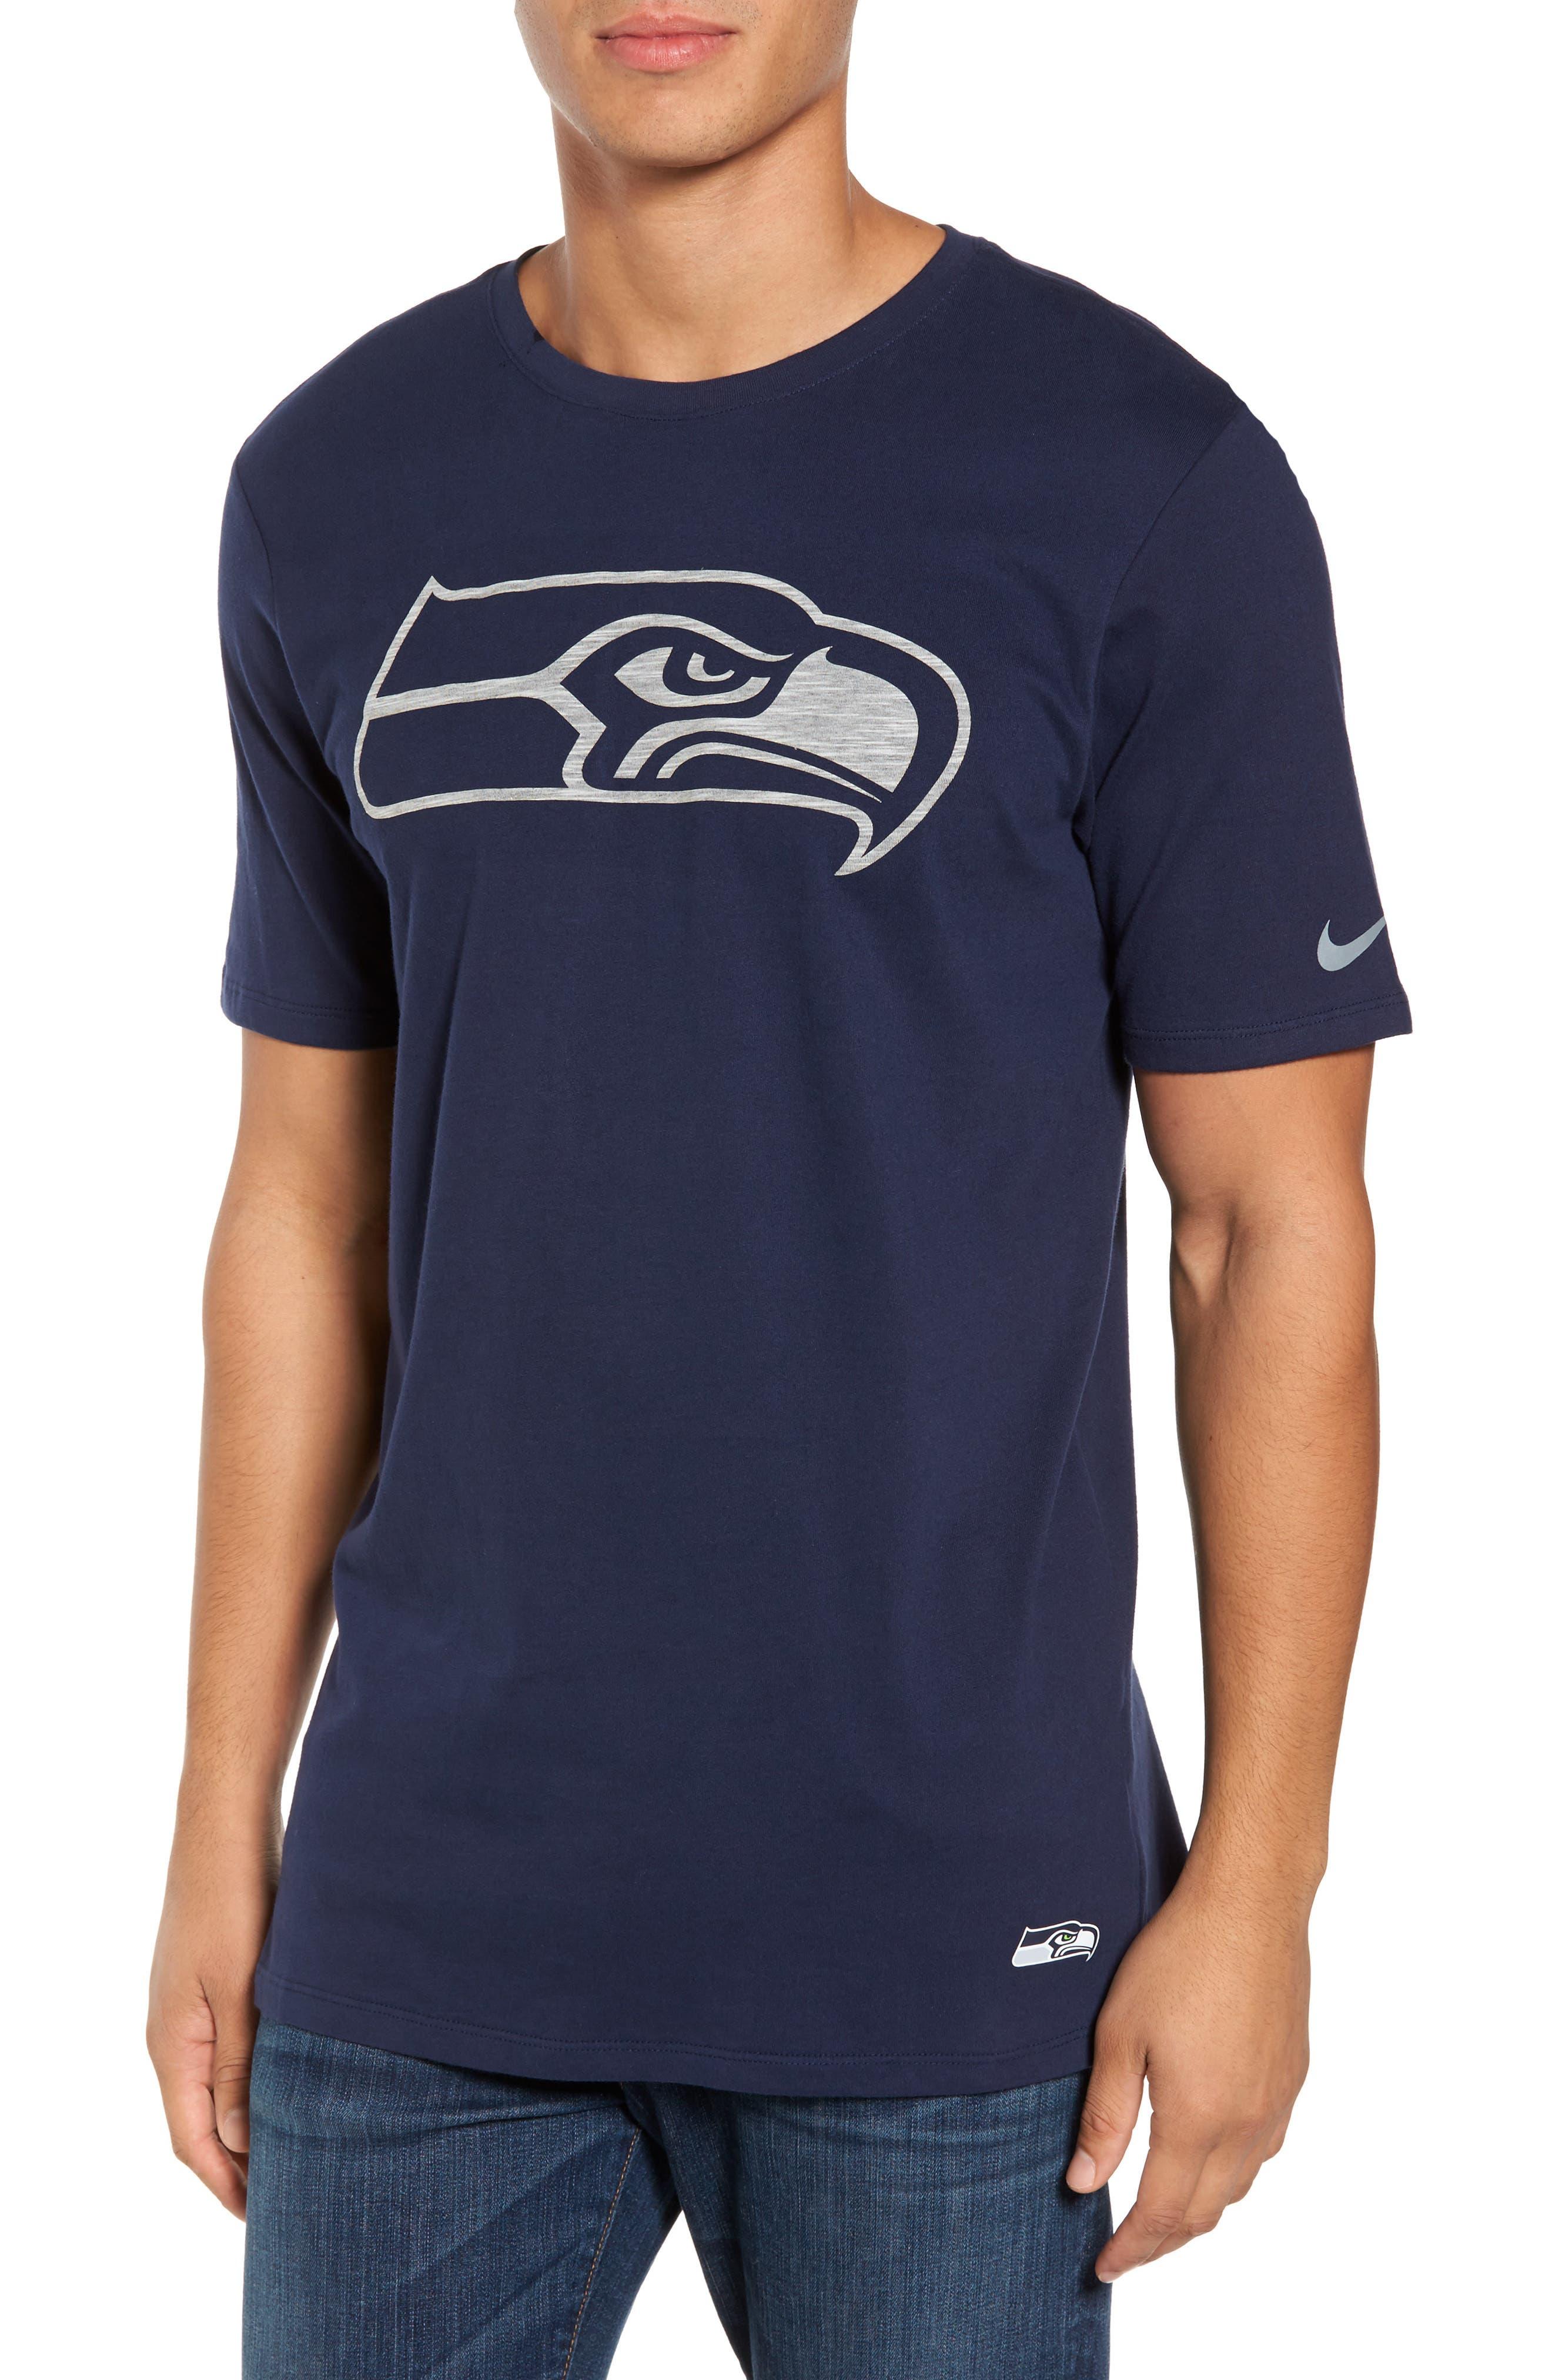 Main Image - Nike NFL Team Graphic T-Shirt